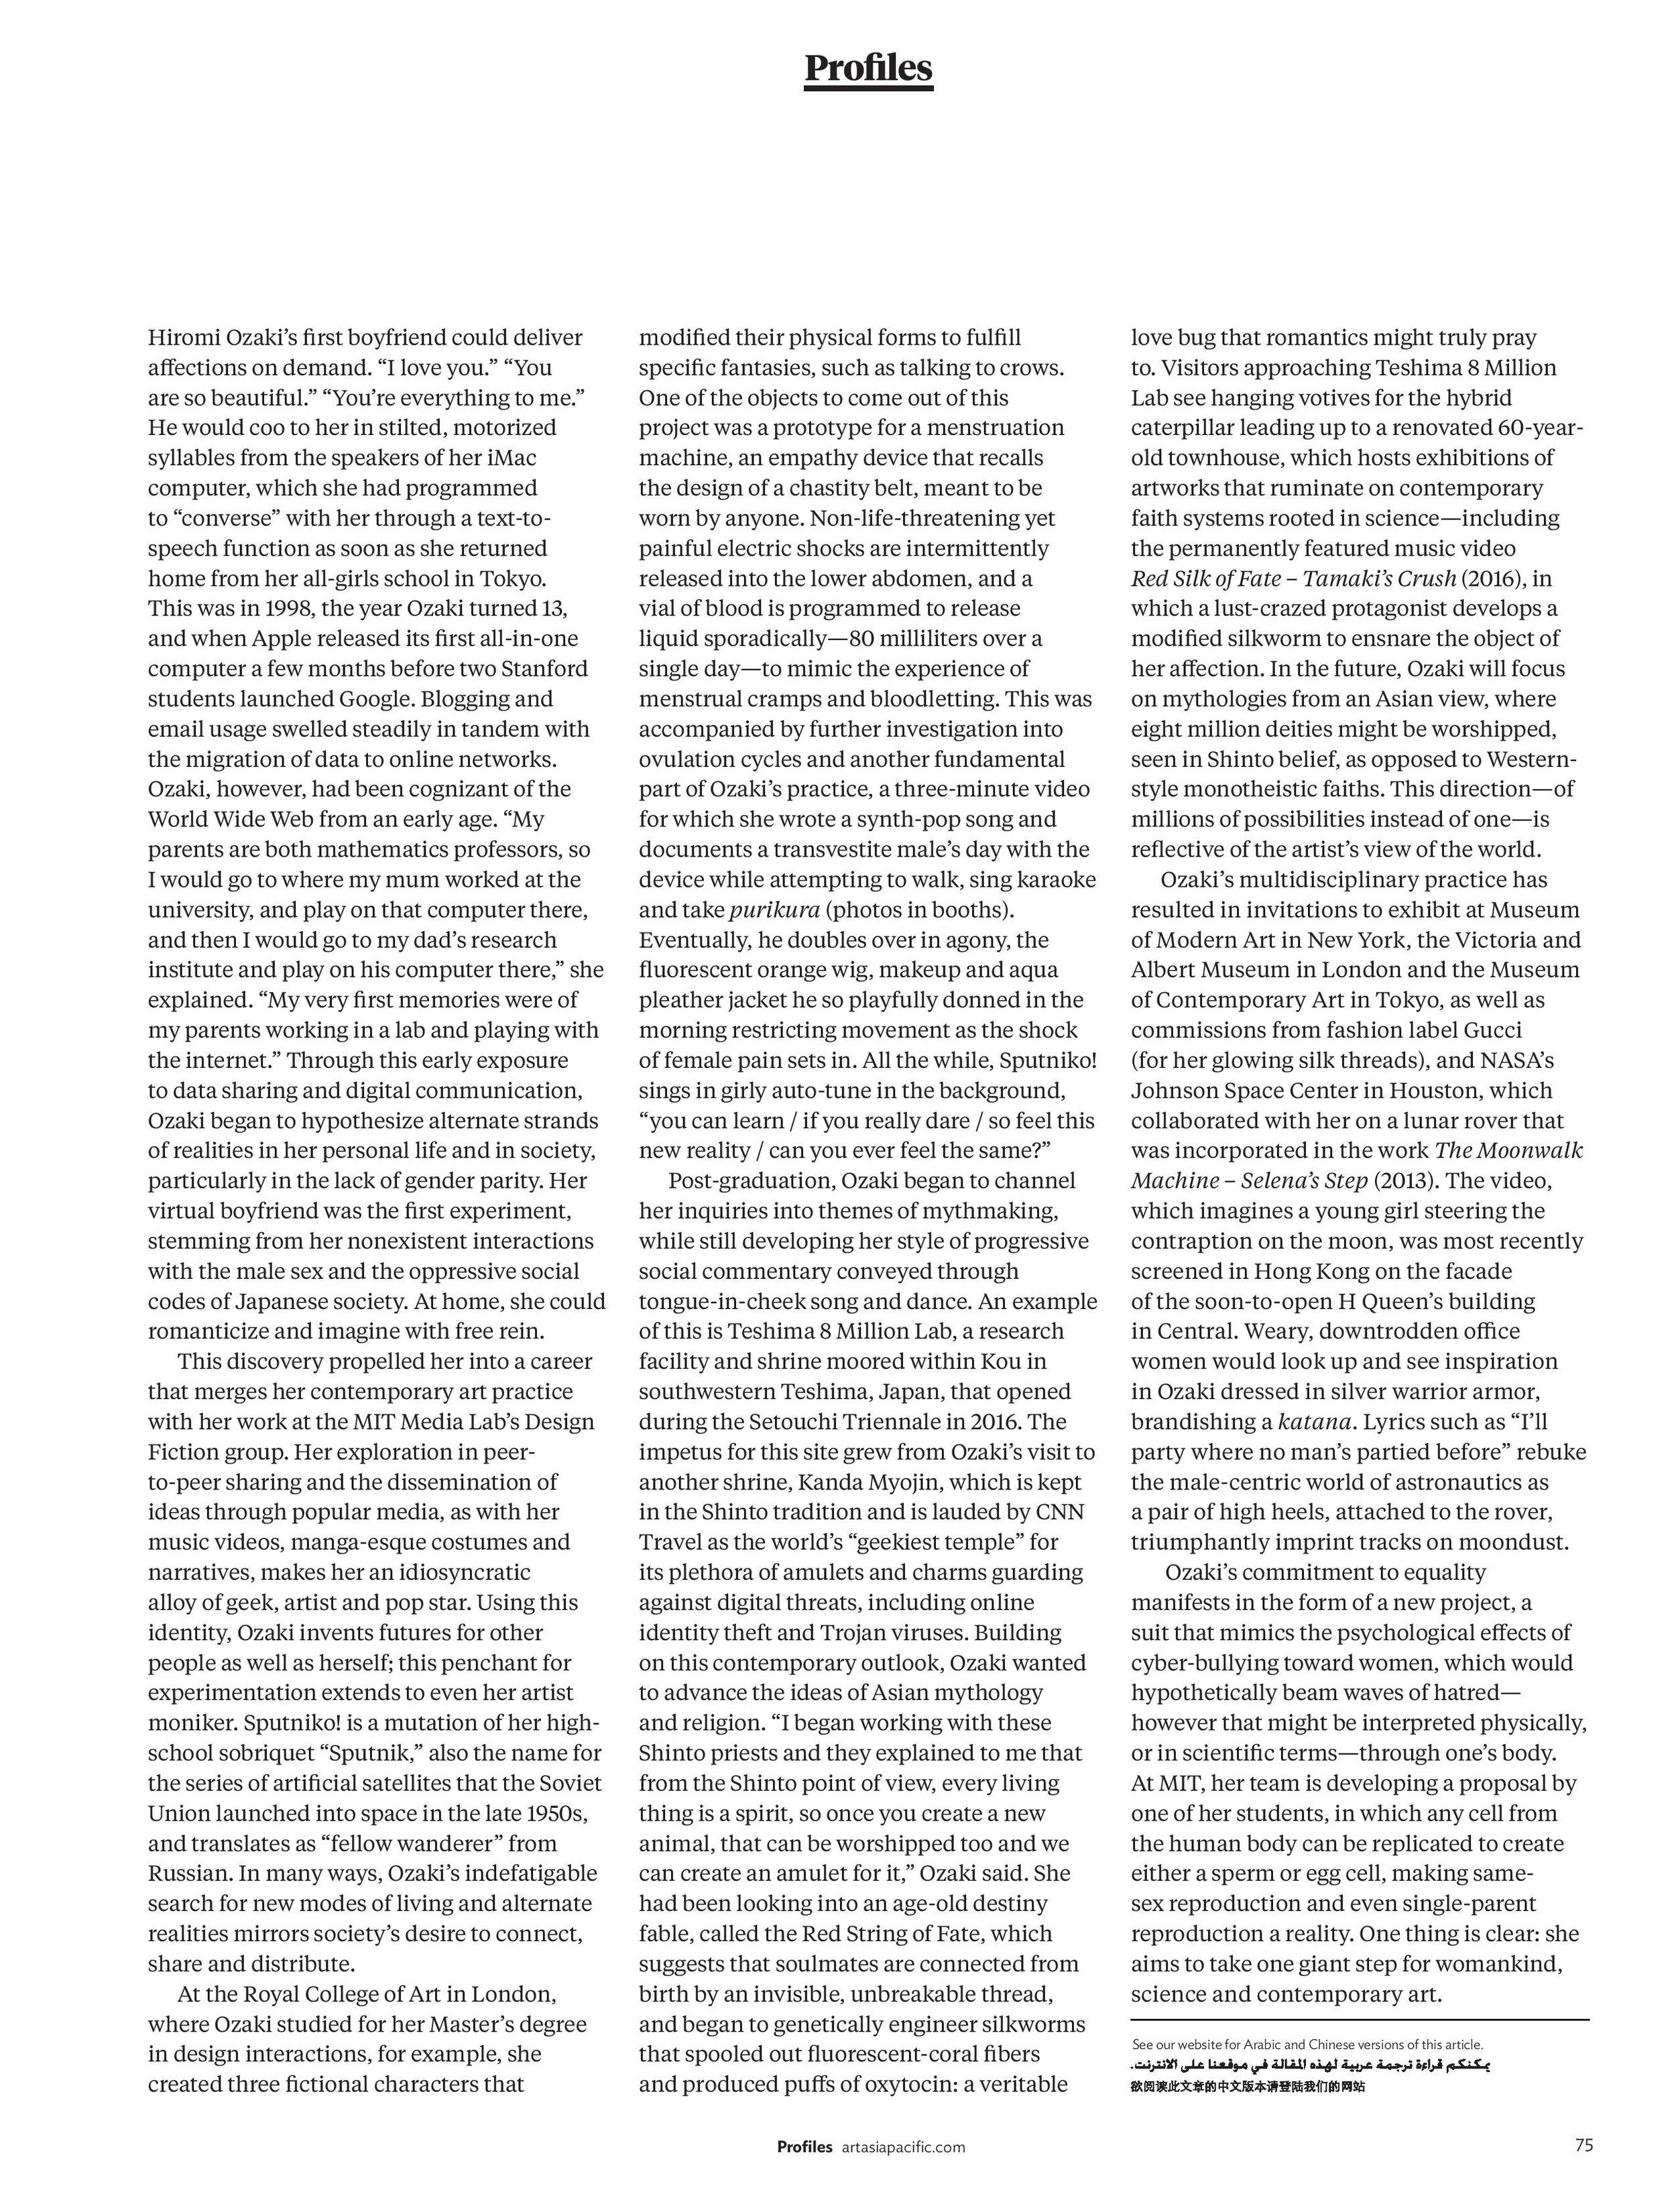 105_Profile-page-002.jpg